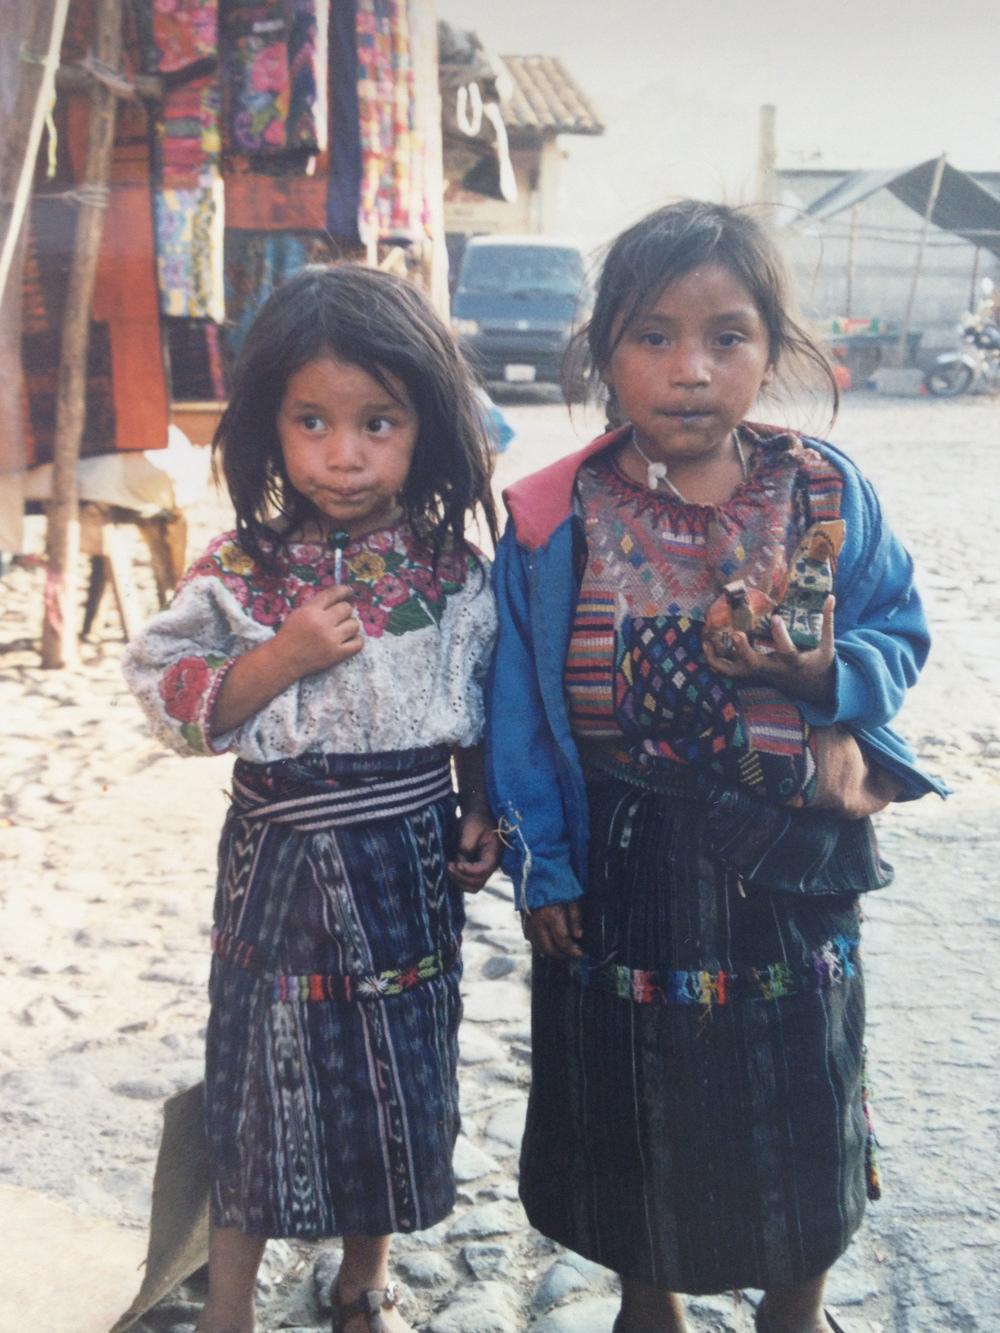 mercati caratteristici Chinchero Perù